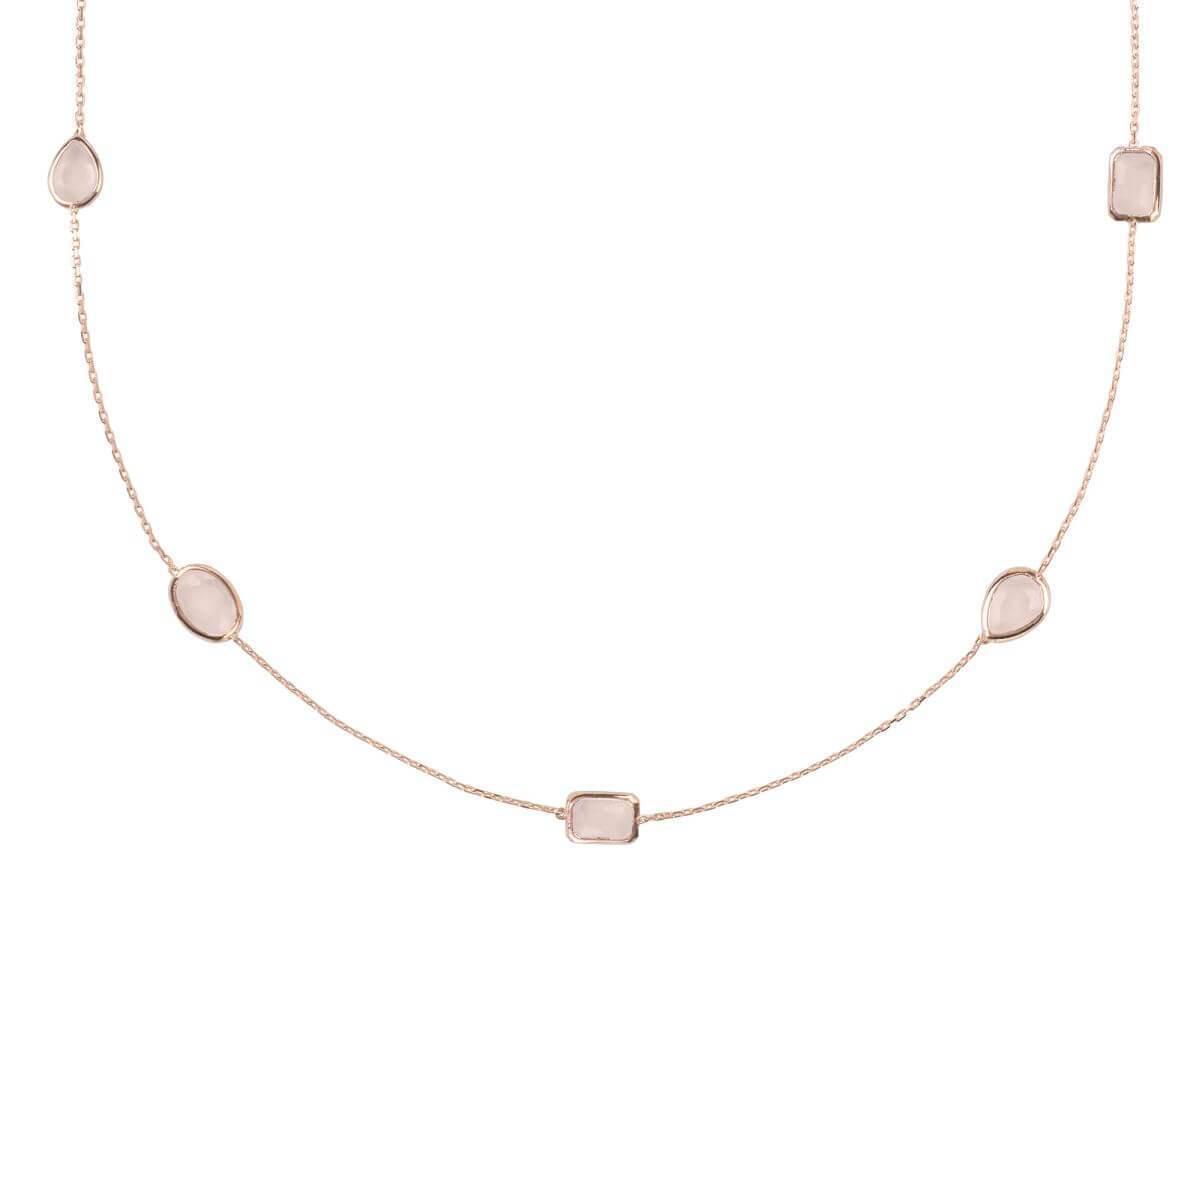 Latelita London Venice Long Chain Necklace Rose Gold Smoky Quartz HEYvp